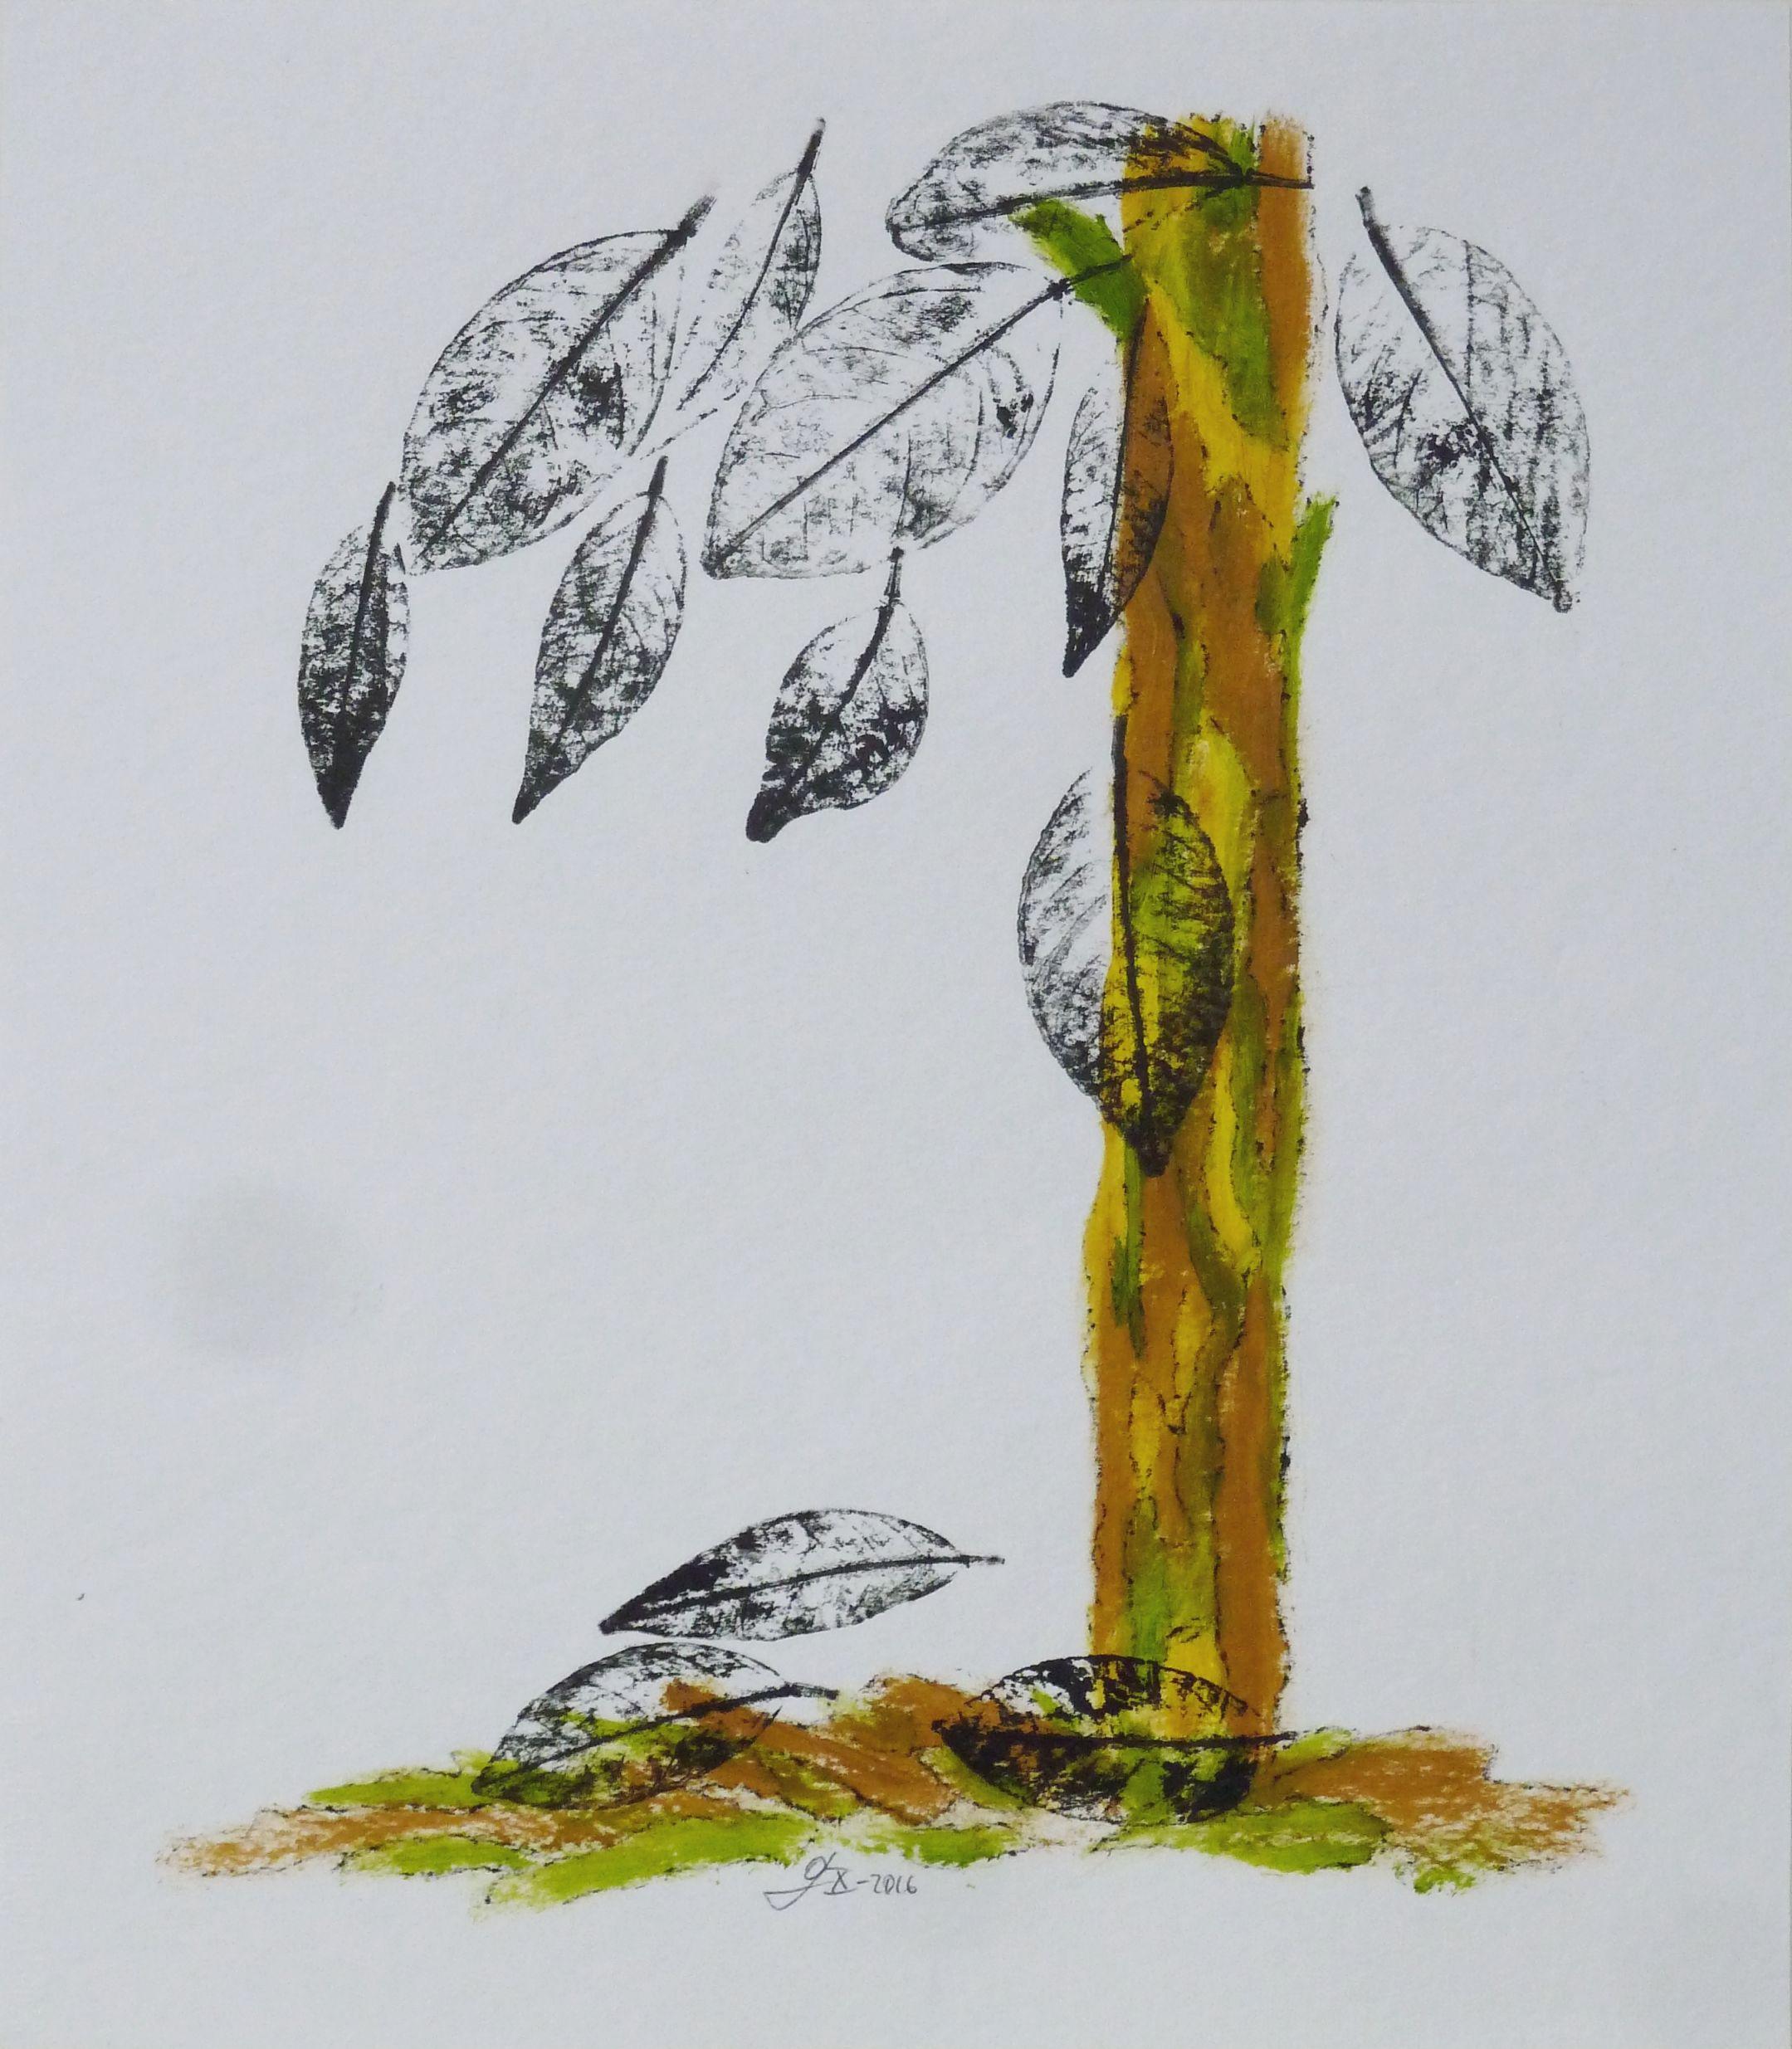 Otoño 5 (2016) - Olga Navarro Pomares